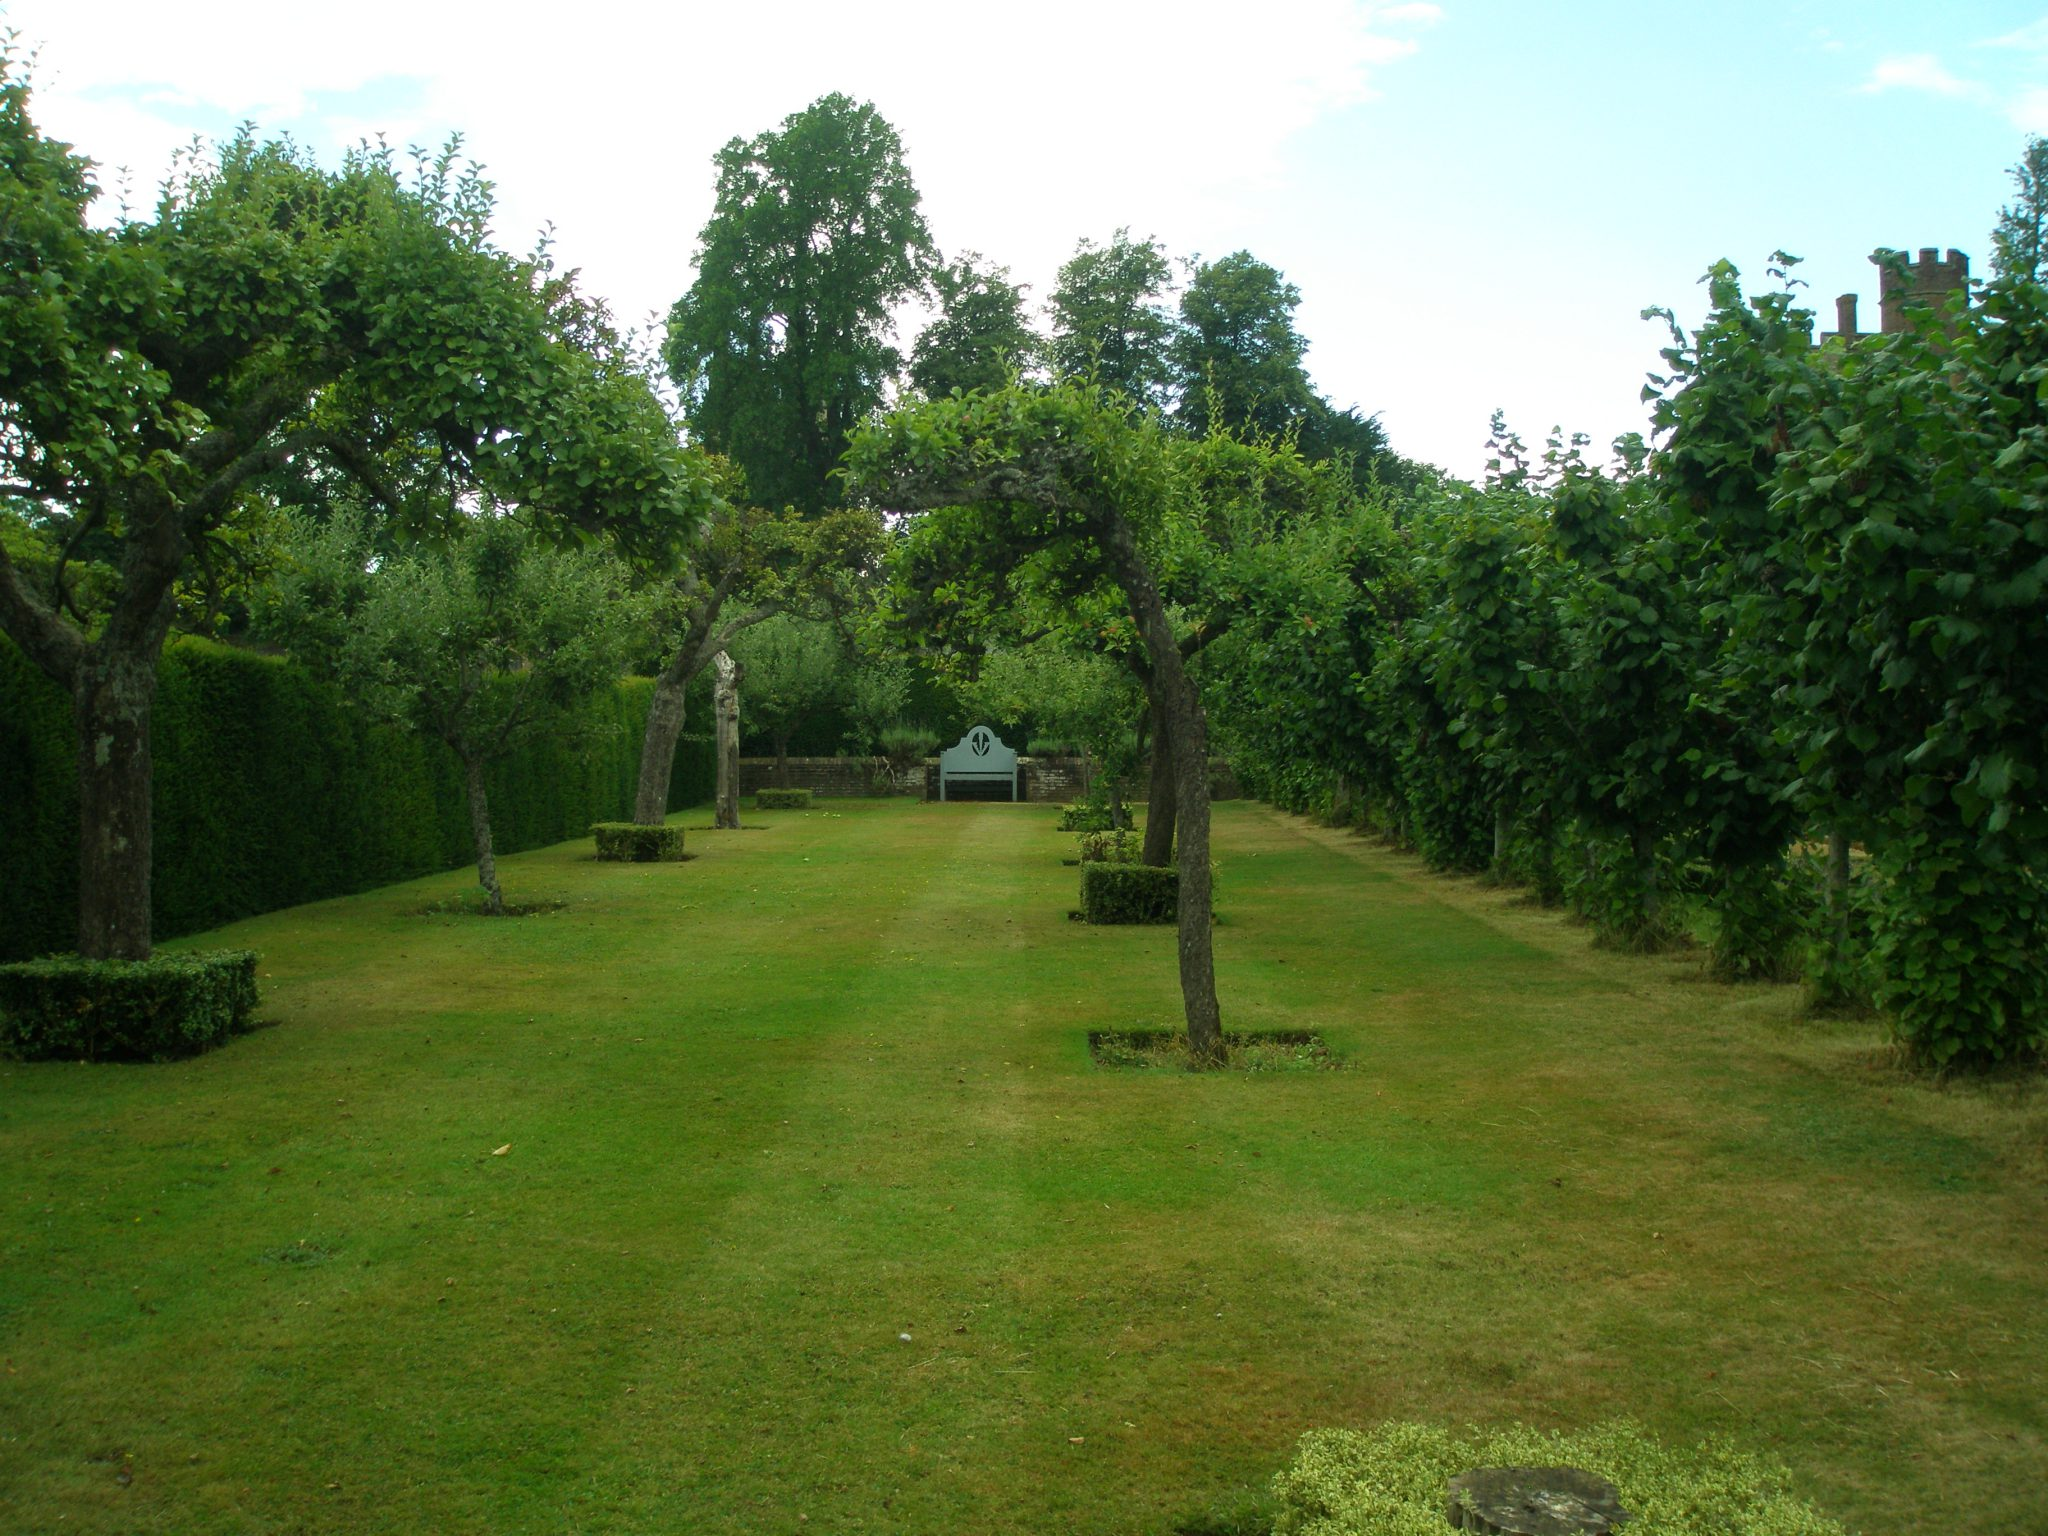 Serene swathes of green flank the Heraldic Garden